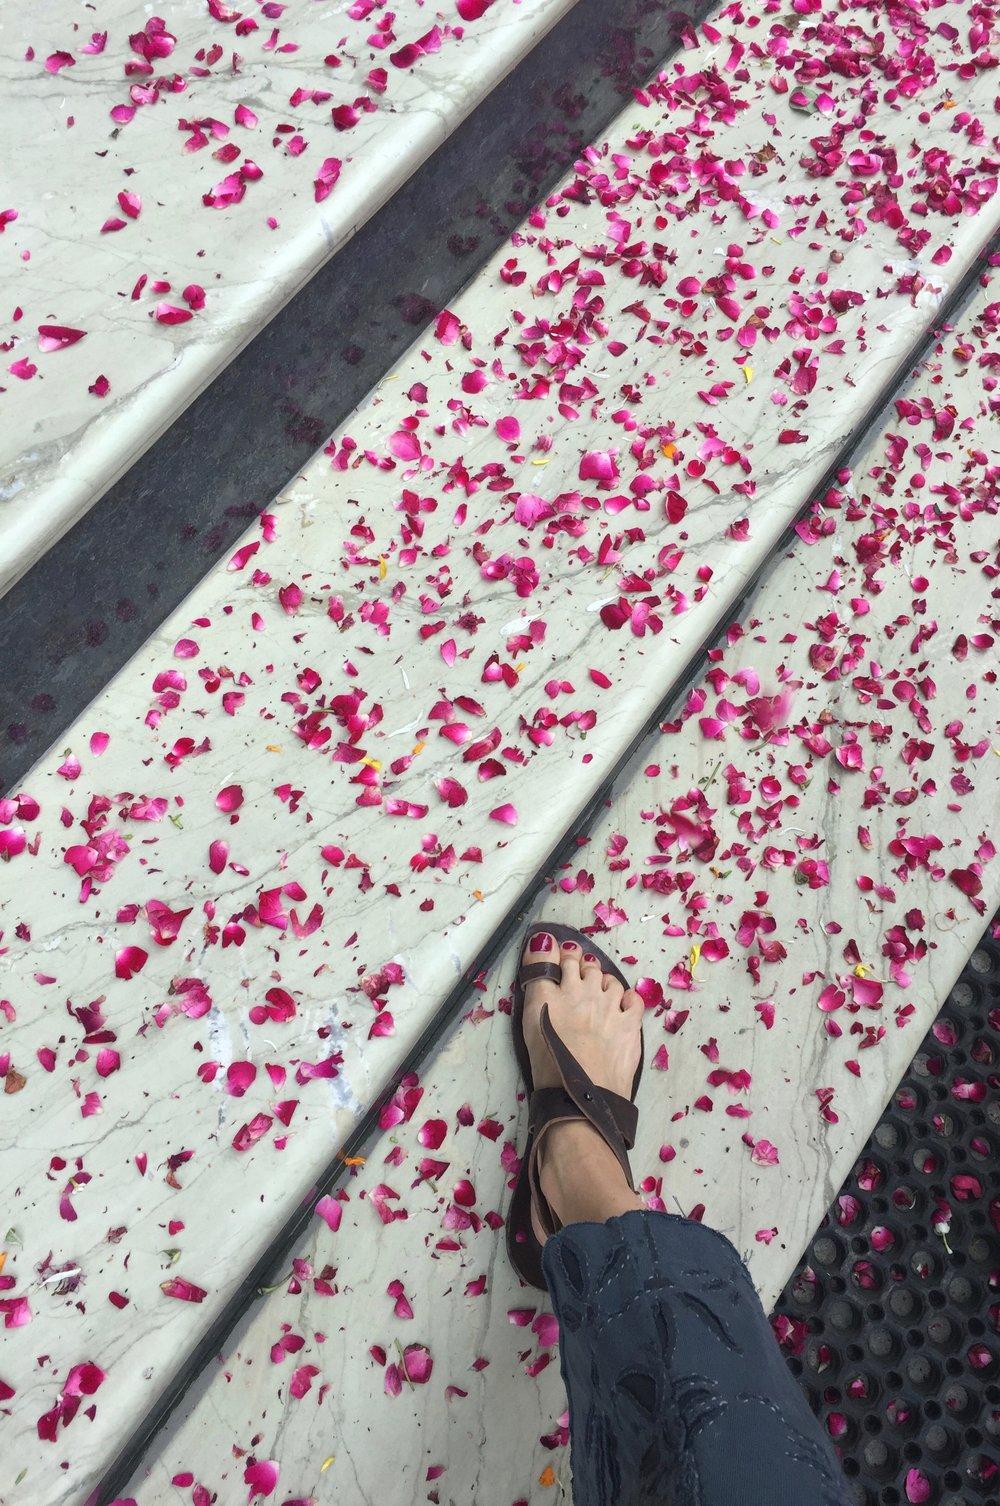 Pink petals on steps.jpg